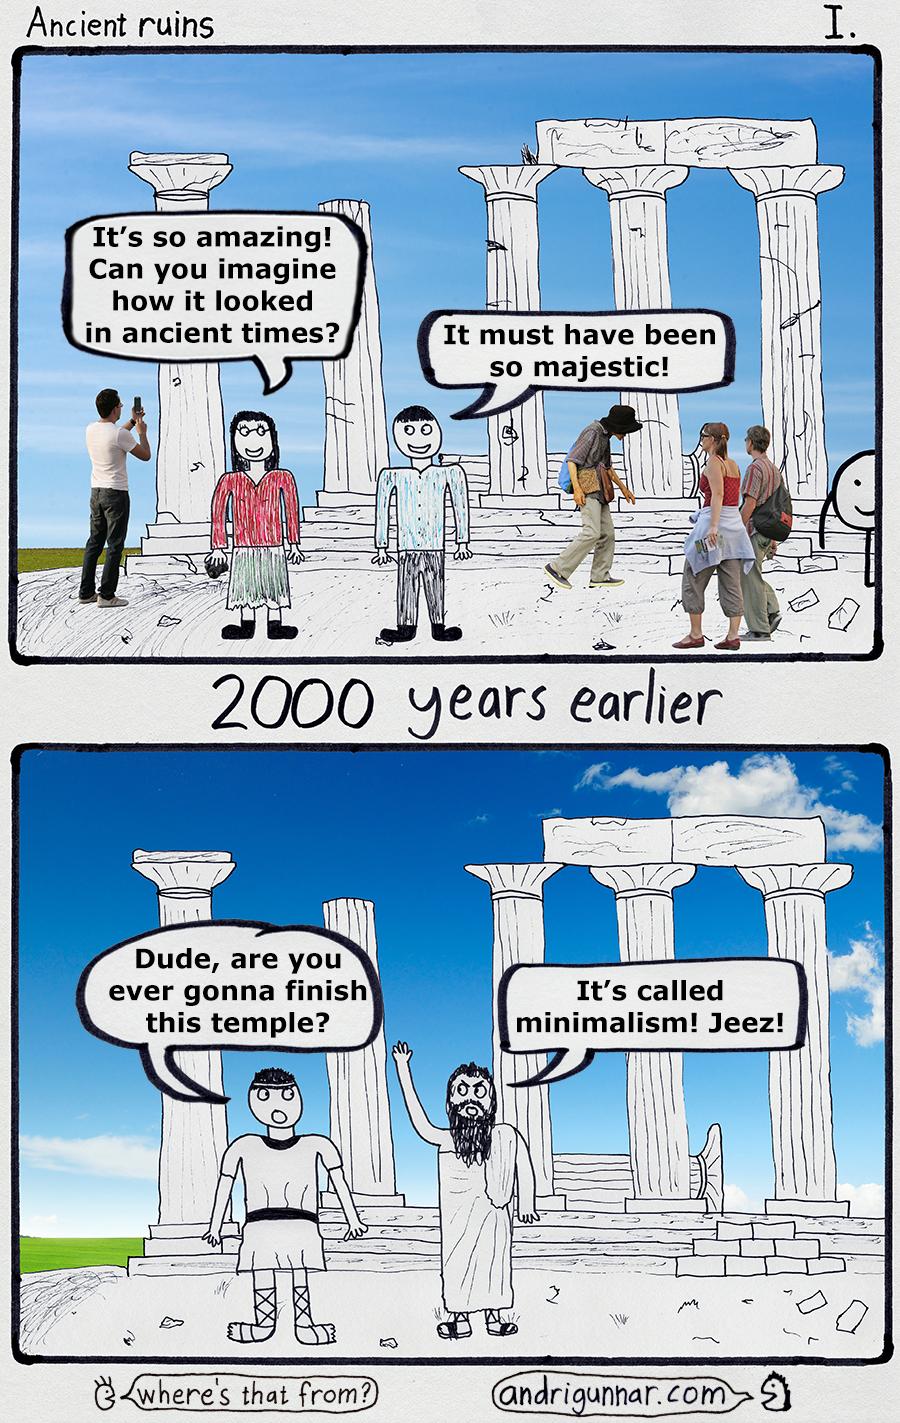 ancient ruins greece comic andri gunnar minimalism funny temple